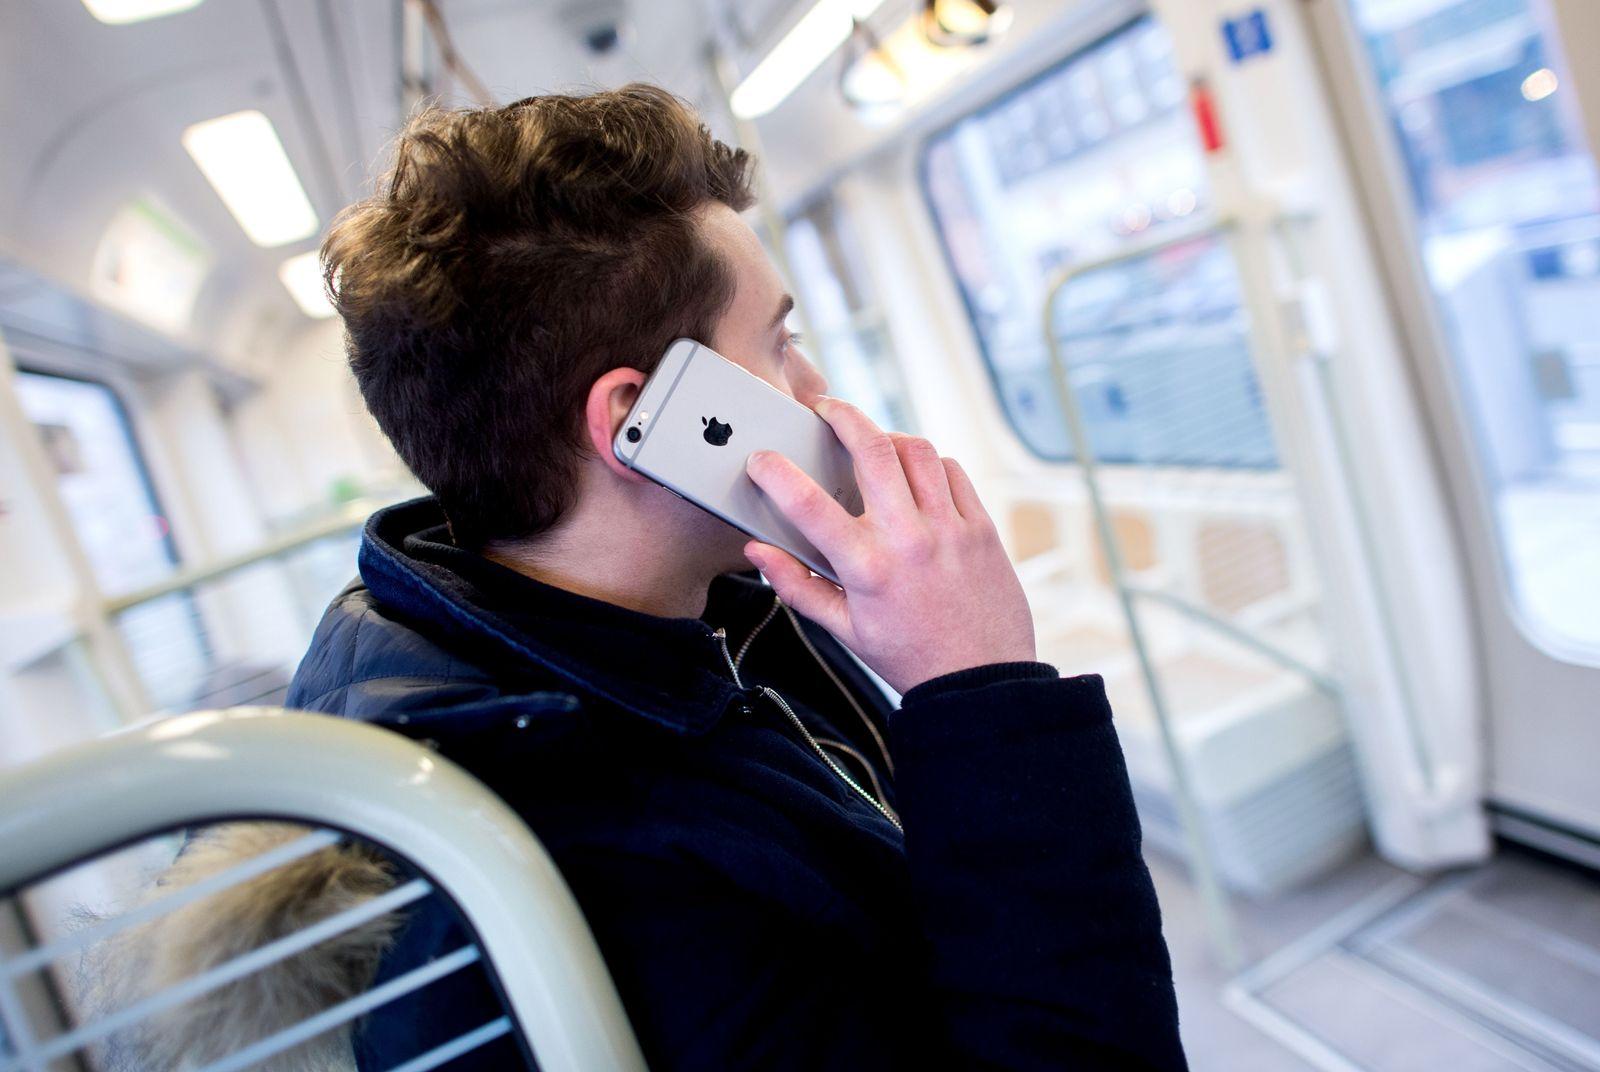 ÖPNV/ Quiz/ telefonieren verboten